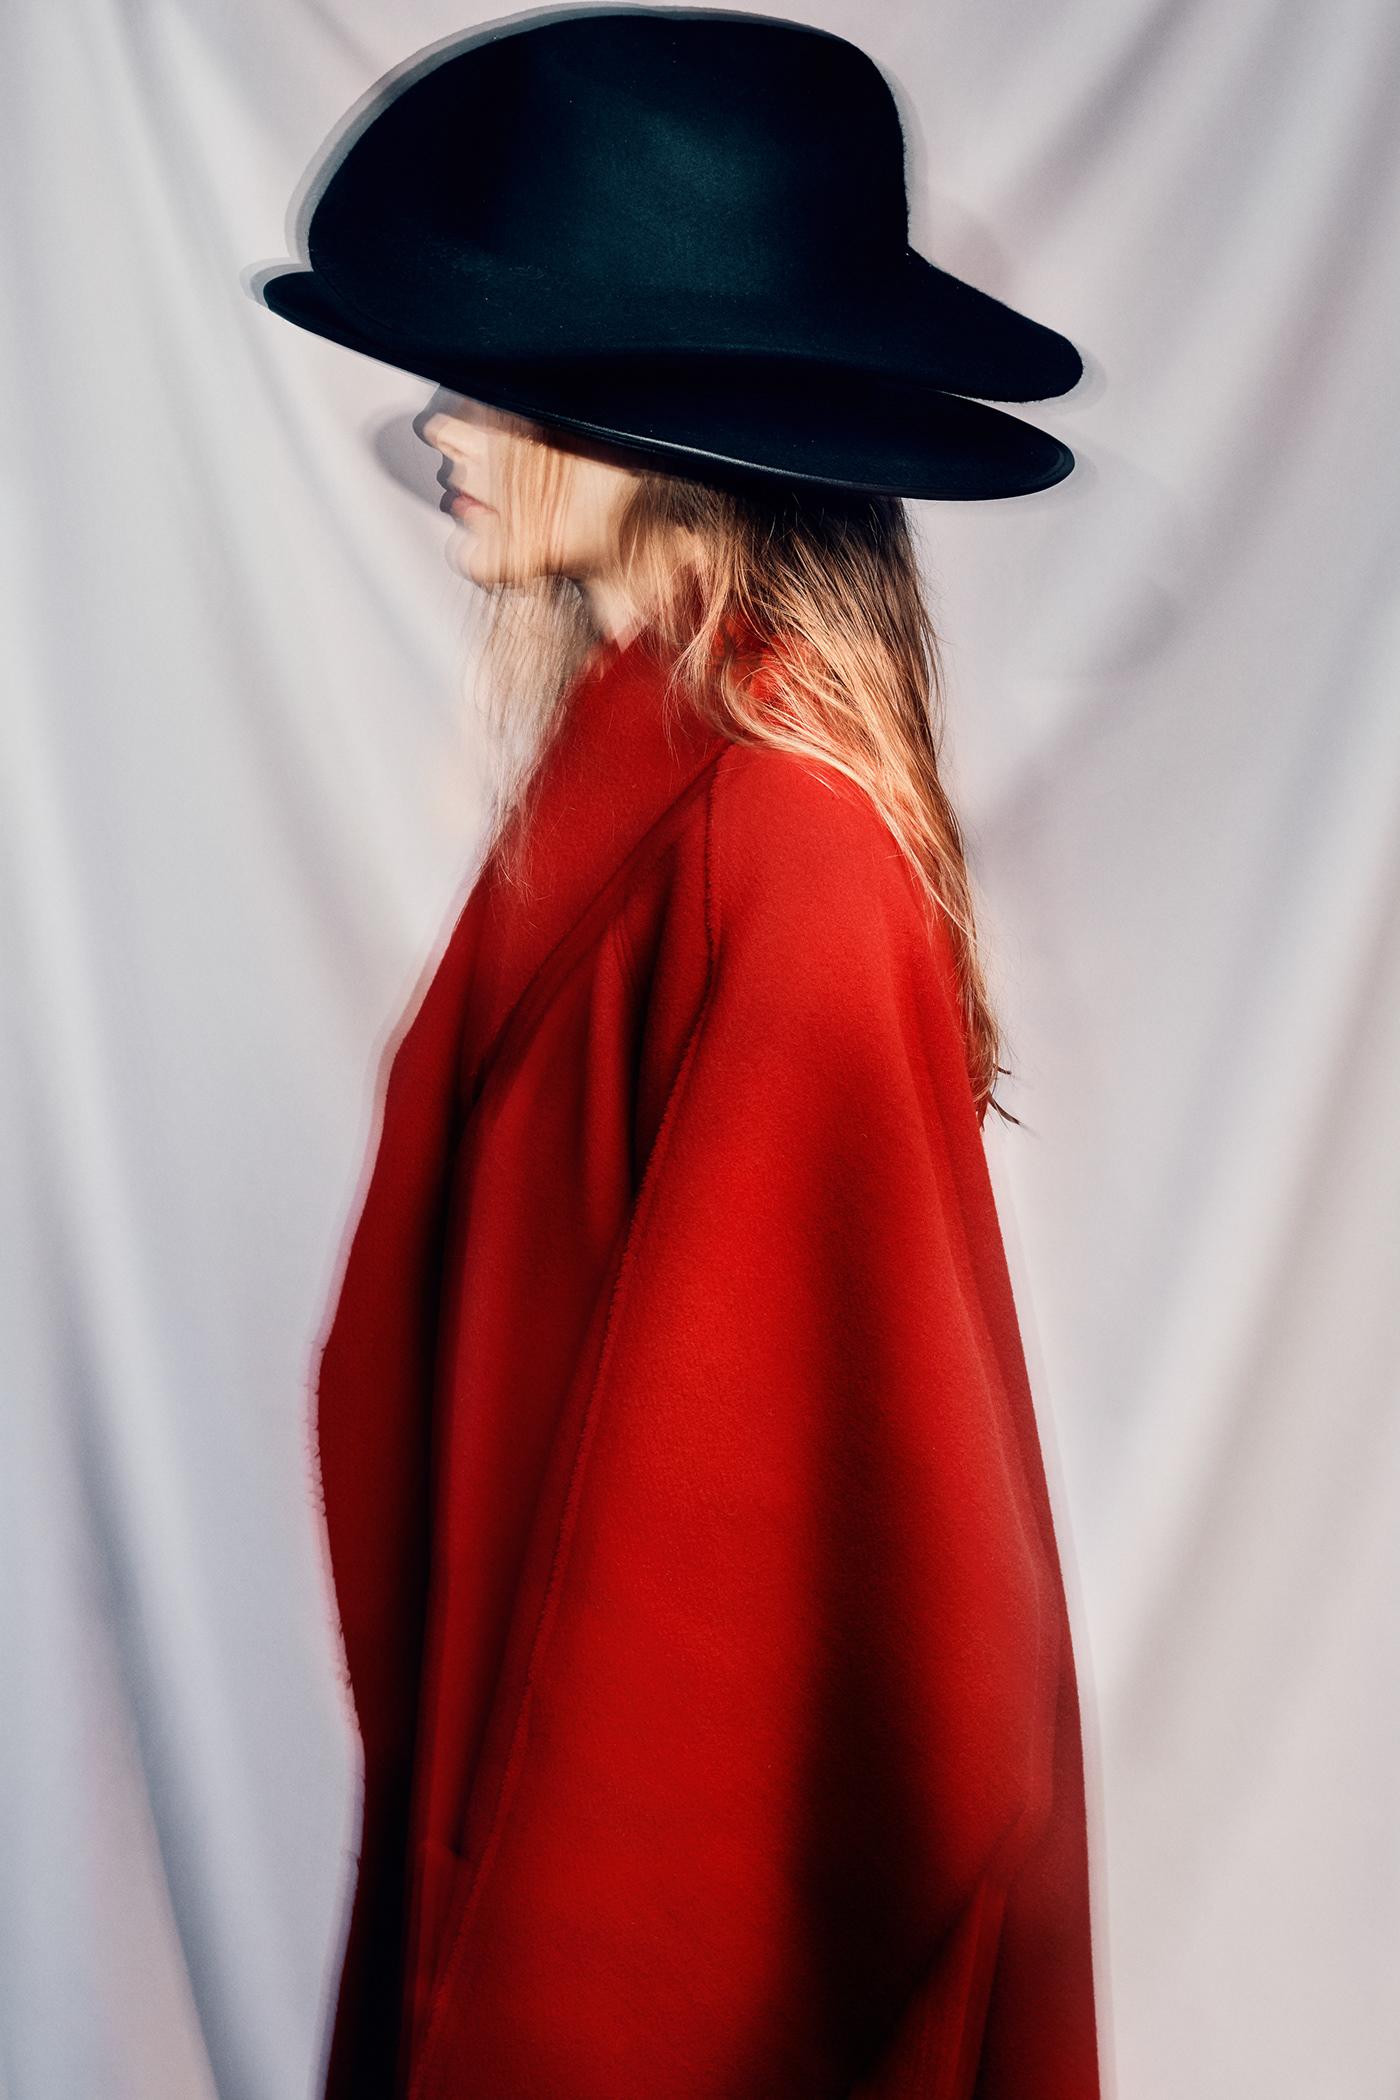 beauty colors editorial Fashion  Love model movement